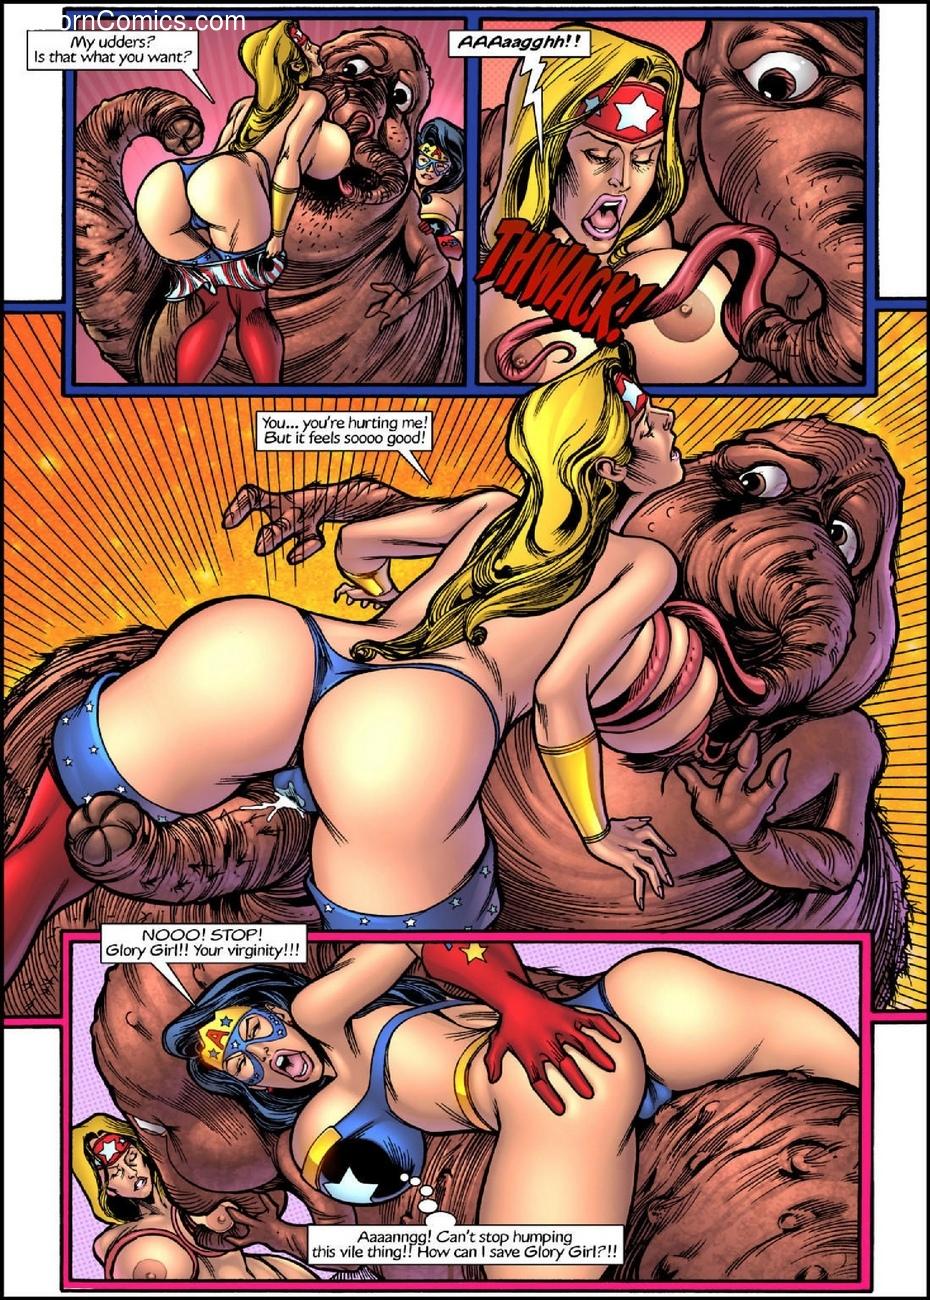 Freedom Stars - Cattle Call 1 35 free sex comic